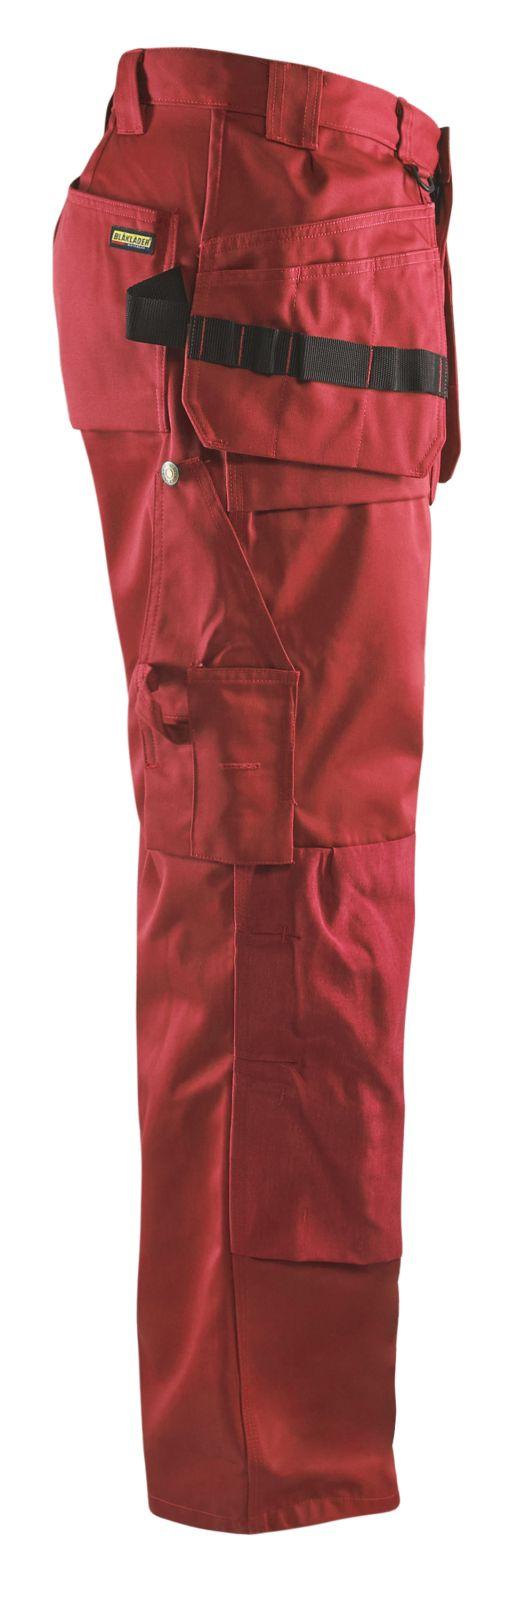 Blaklader Werkbroeken 15301860 rood(5600)